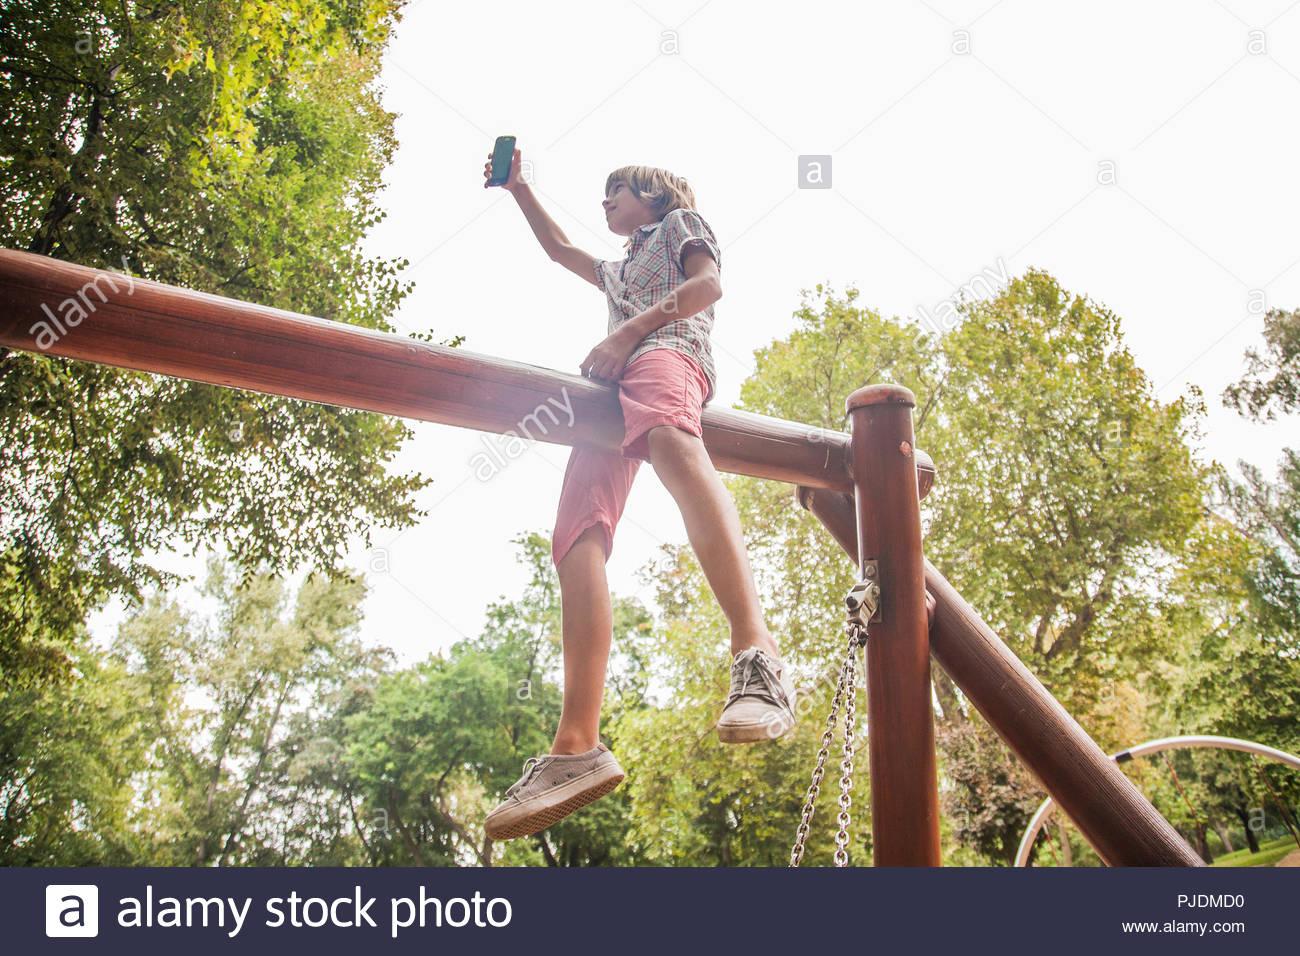 Boy taking selfie on playground equipment - Stock Image